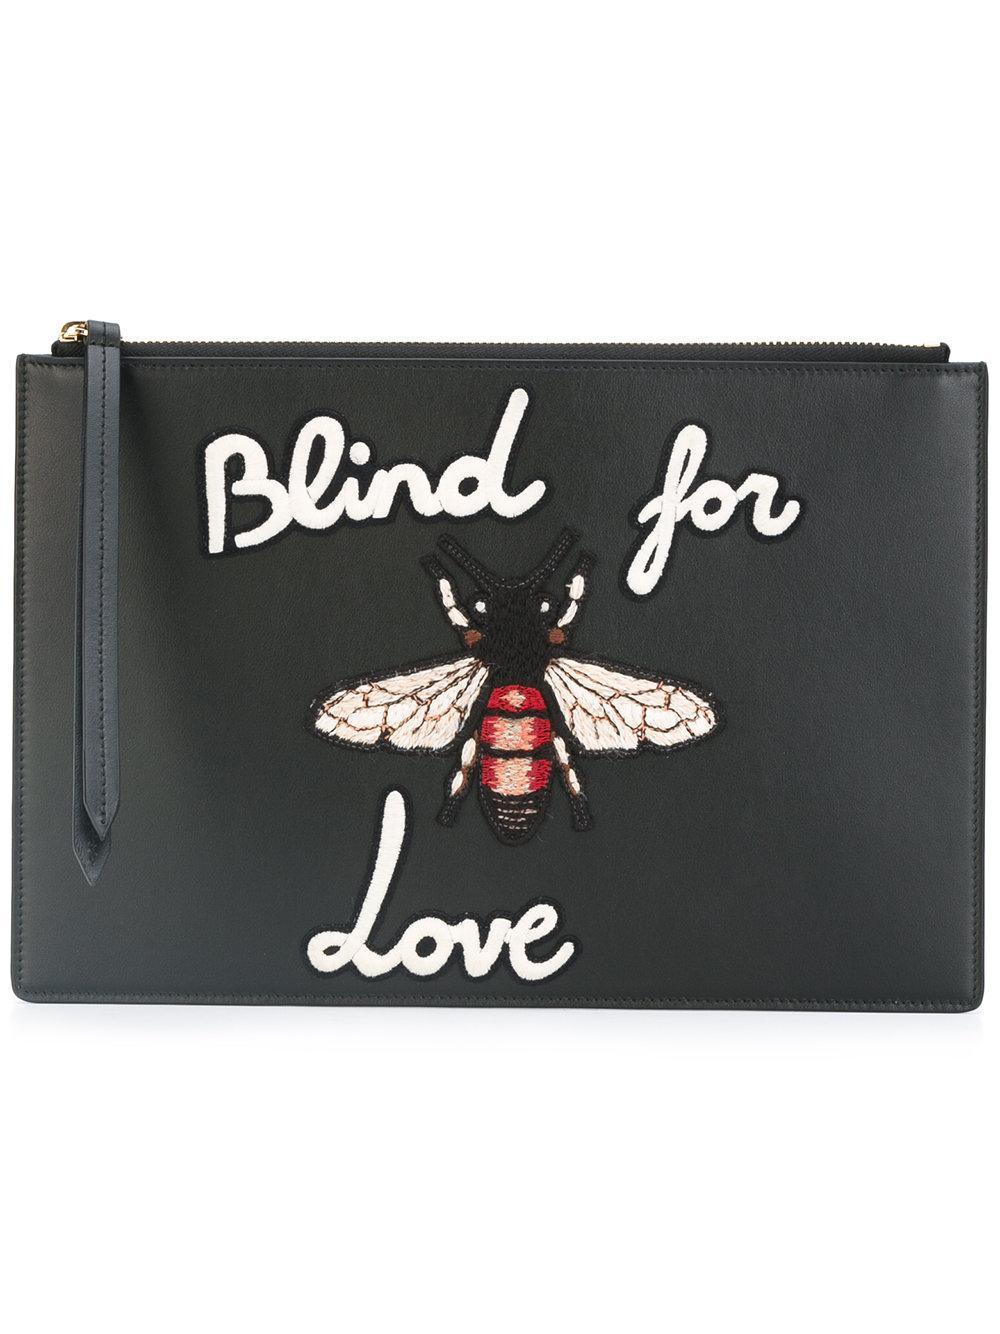 4fe47a64cb44 Gucci Blind For Love Clutch Bag in Black - Lyst